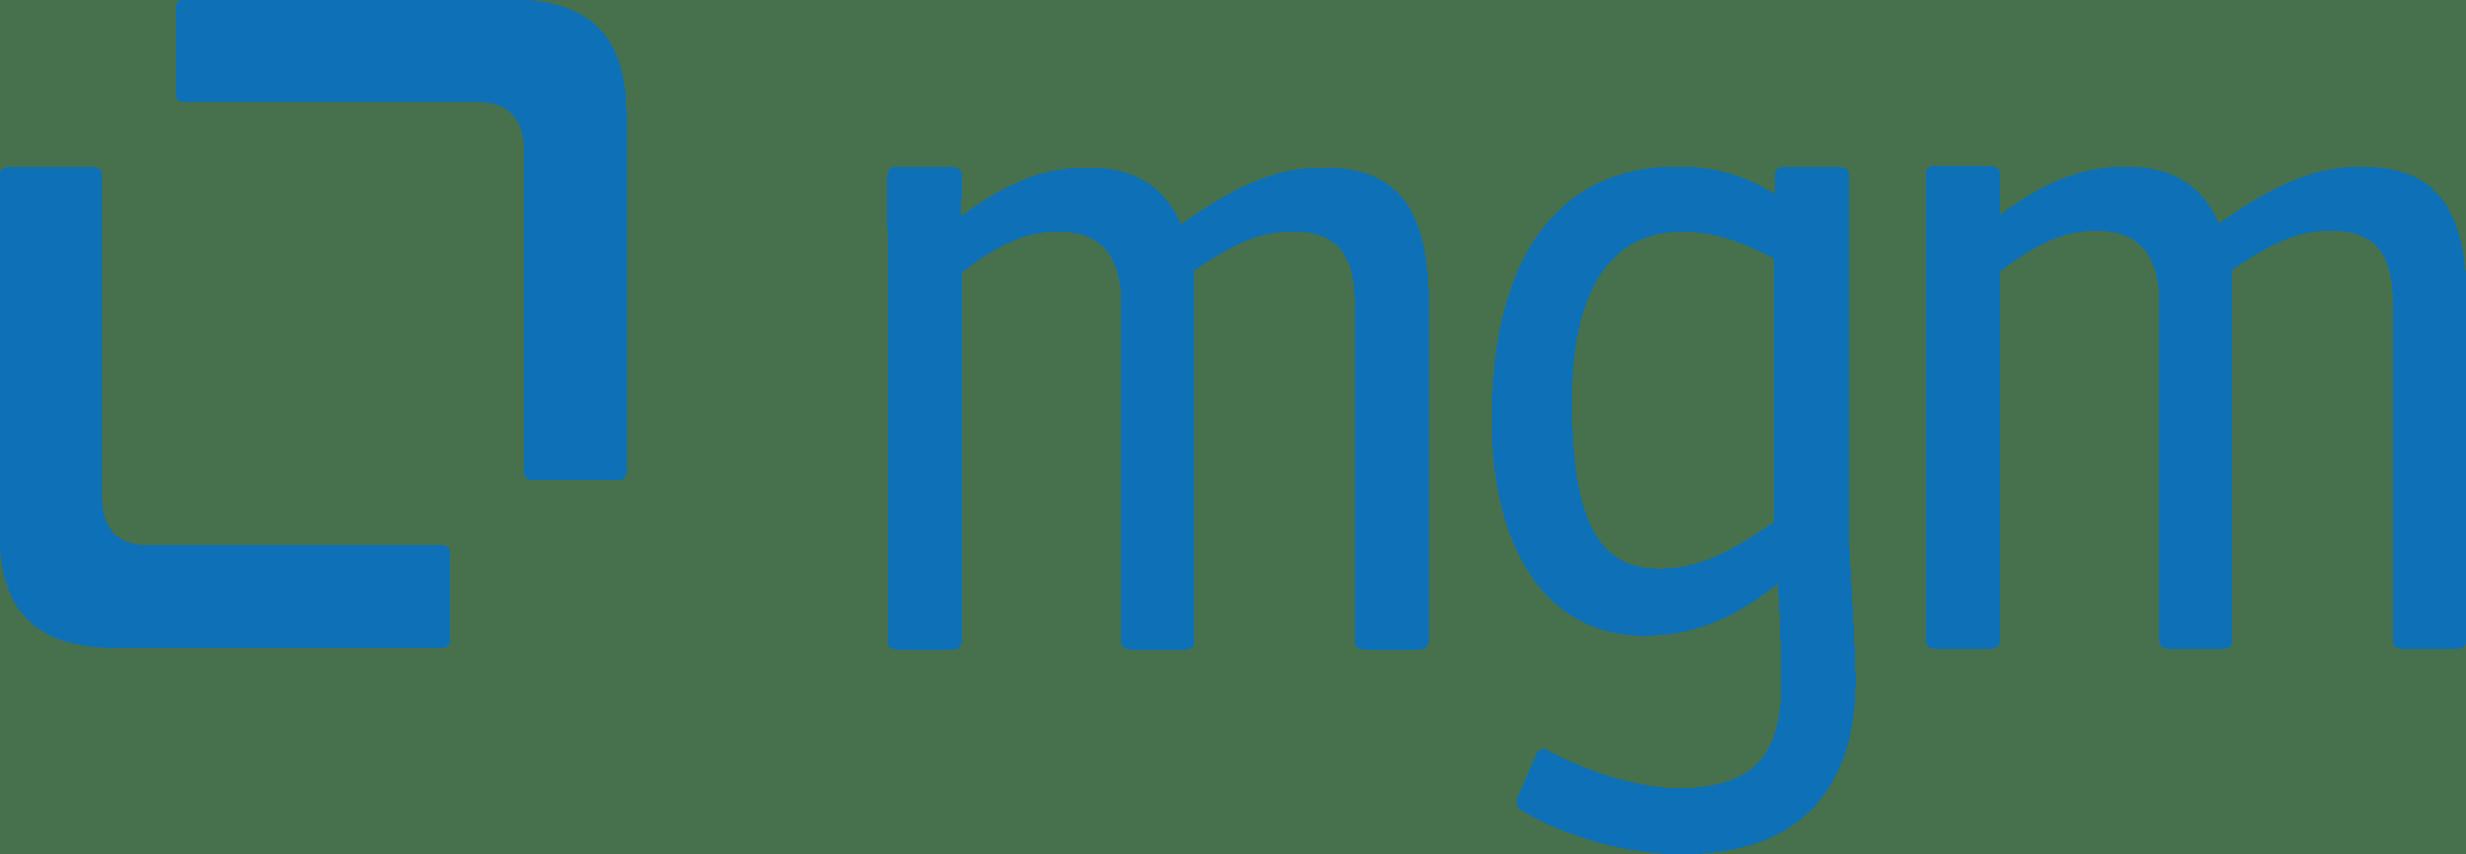 mgm technology partners s.r.o.